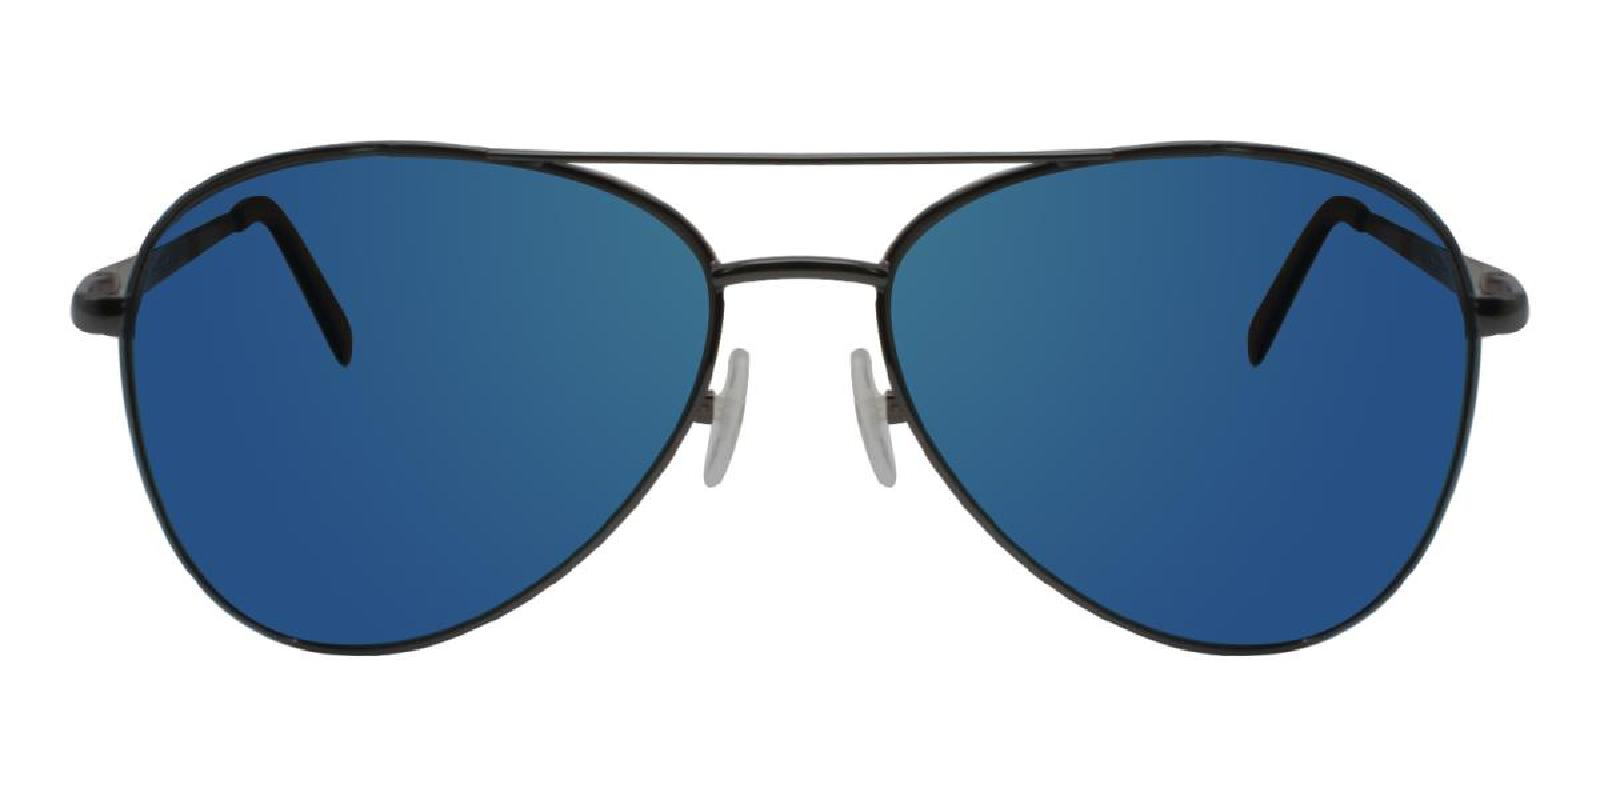 Eudora-Gun-Aviator-Metal-Sunglasses-additional2